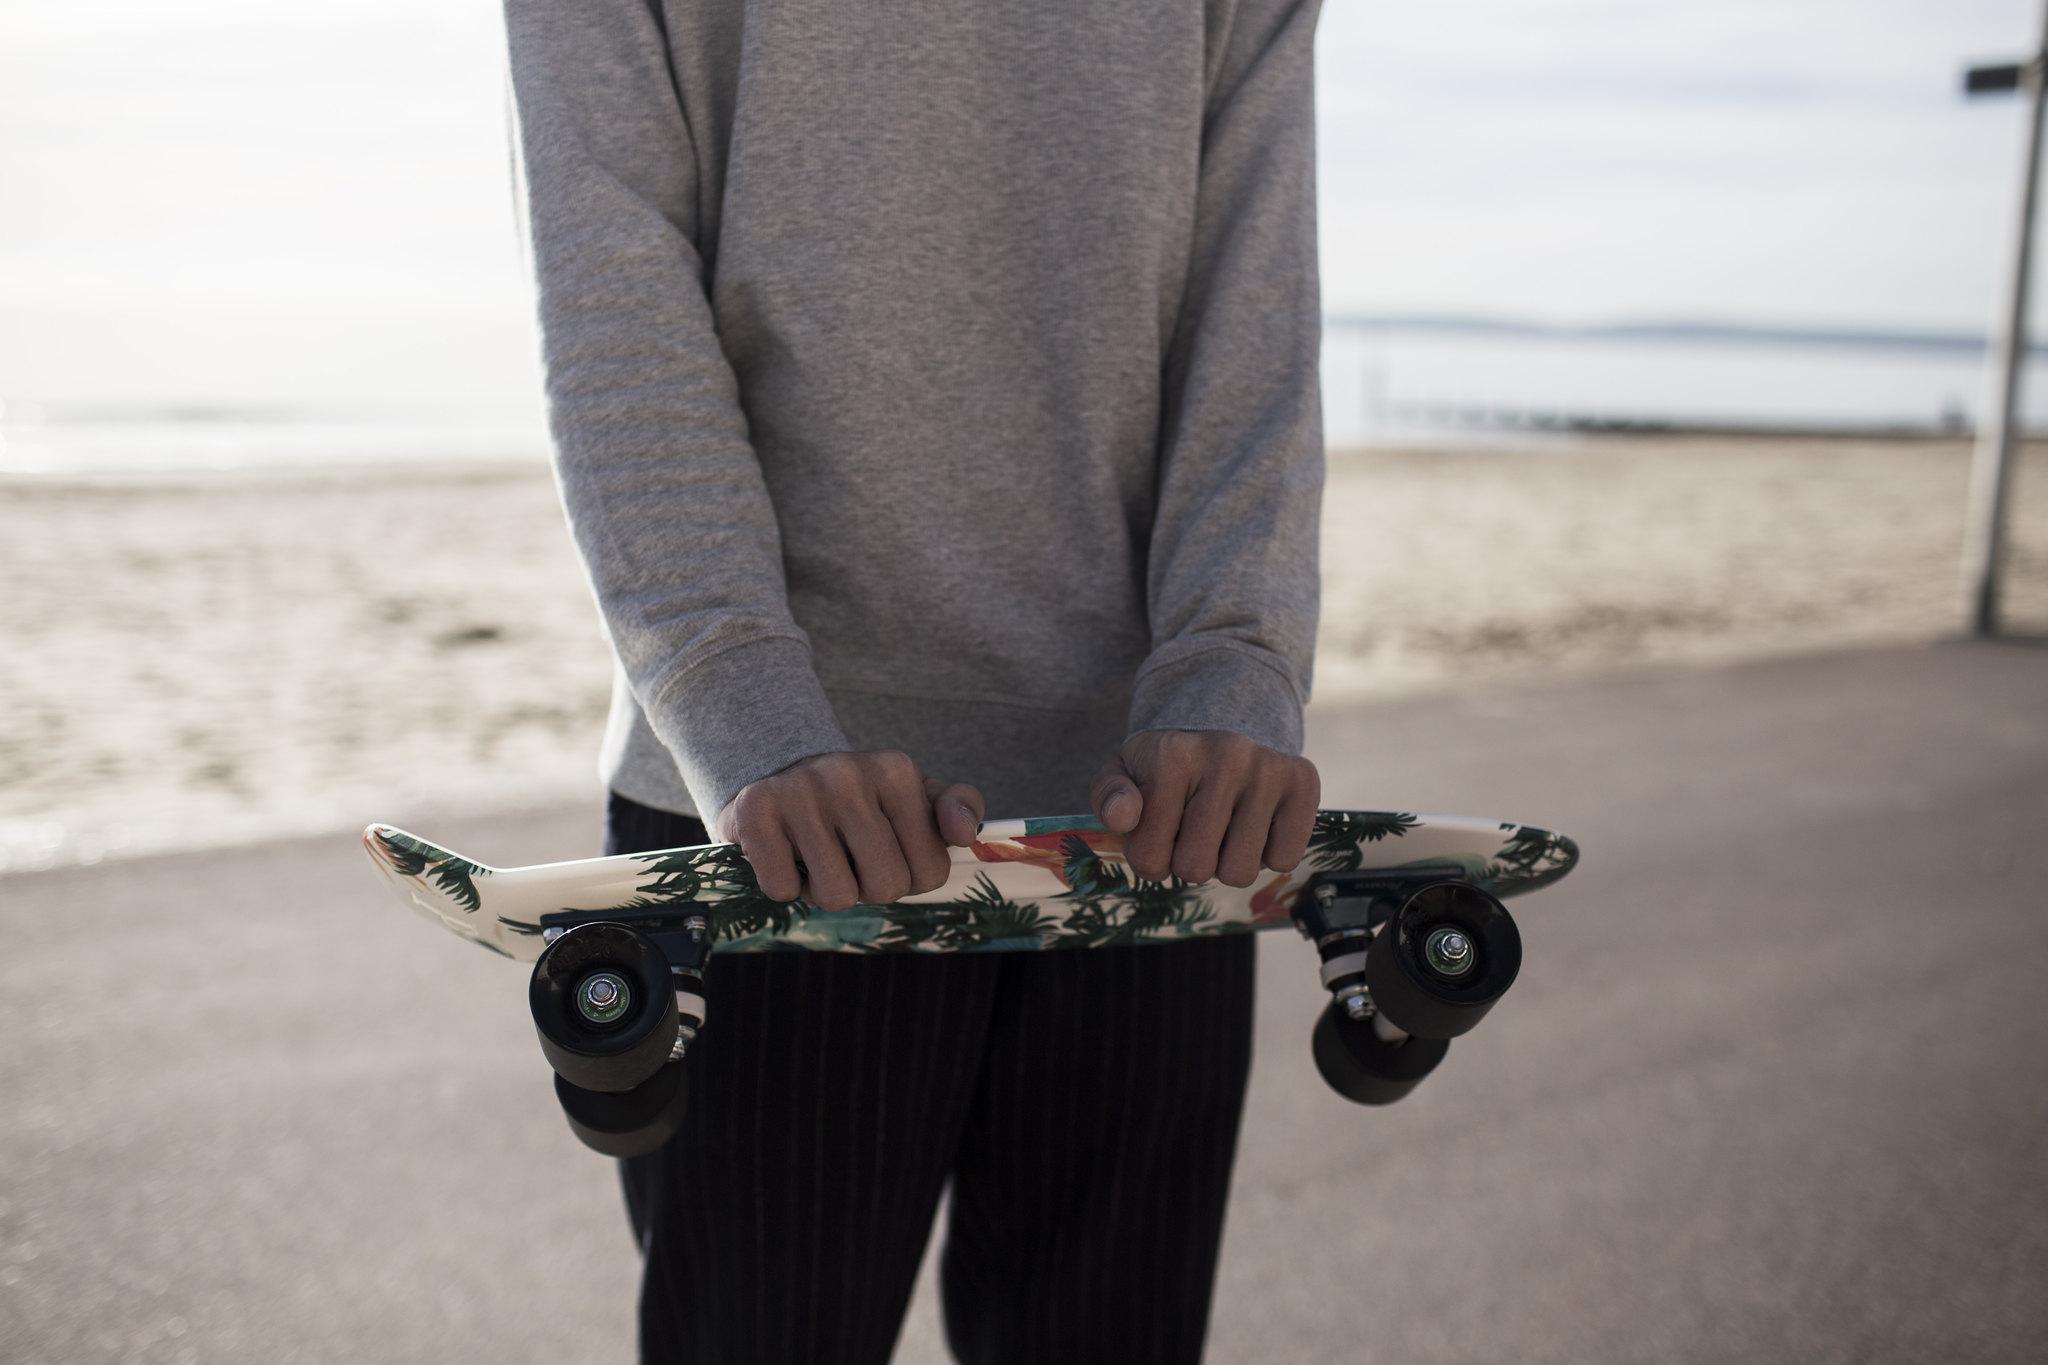 Jordan_Bunker_penny_skateboards_13